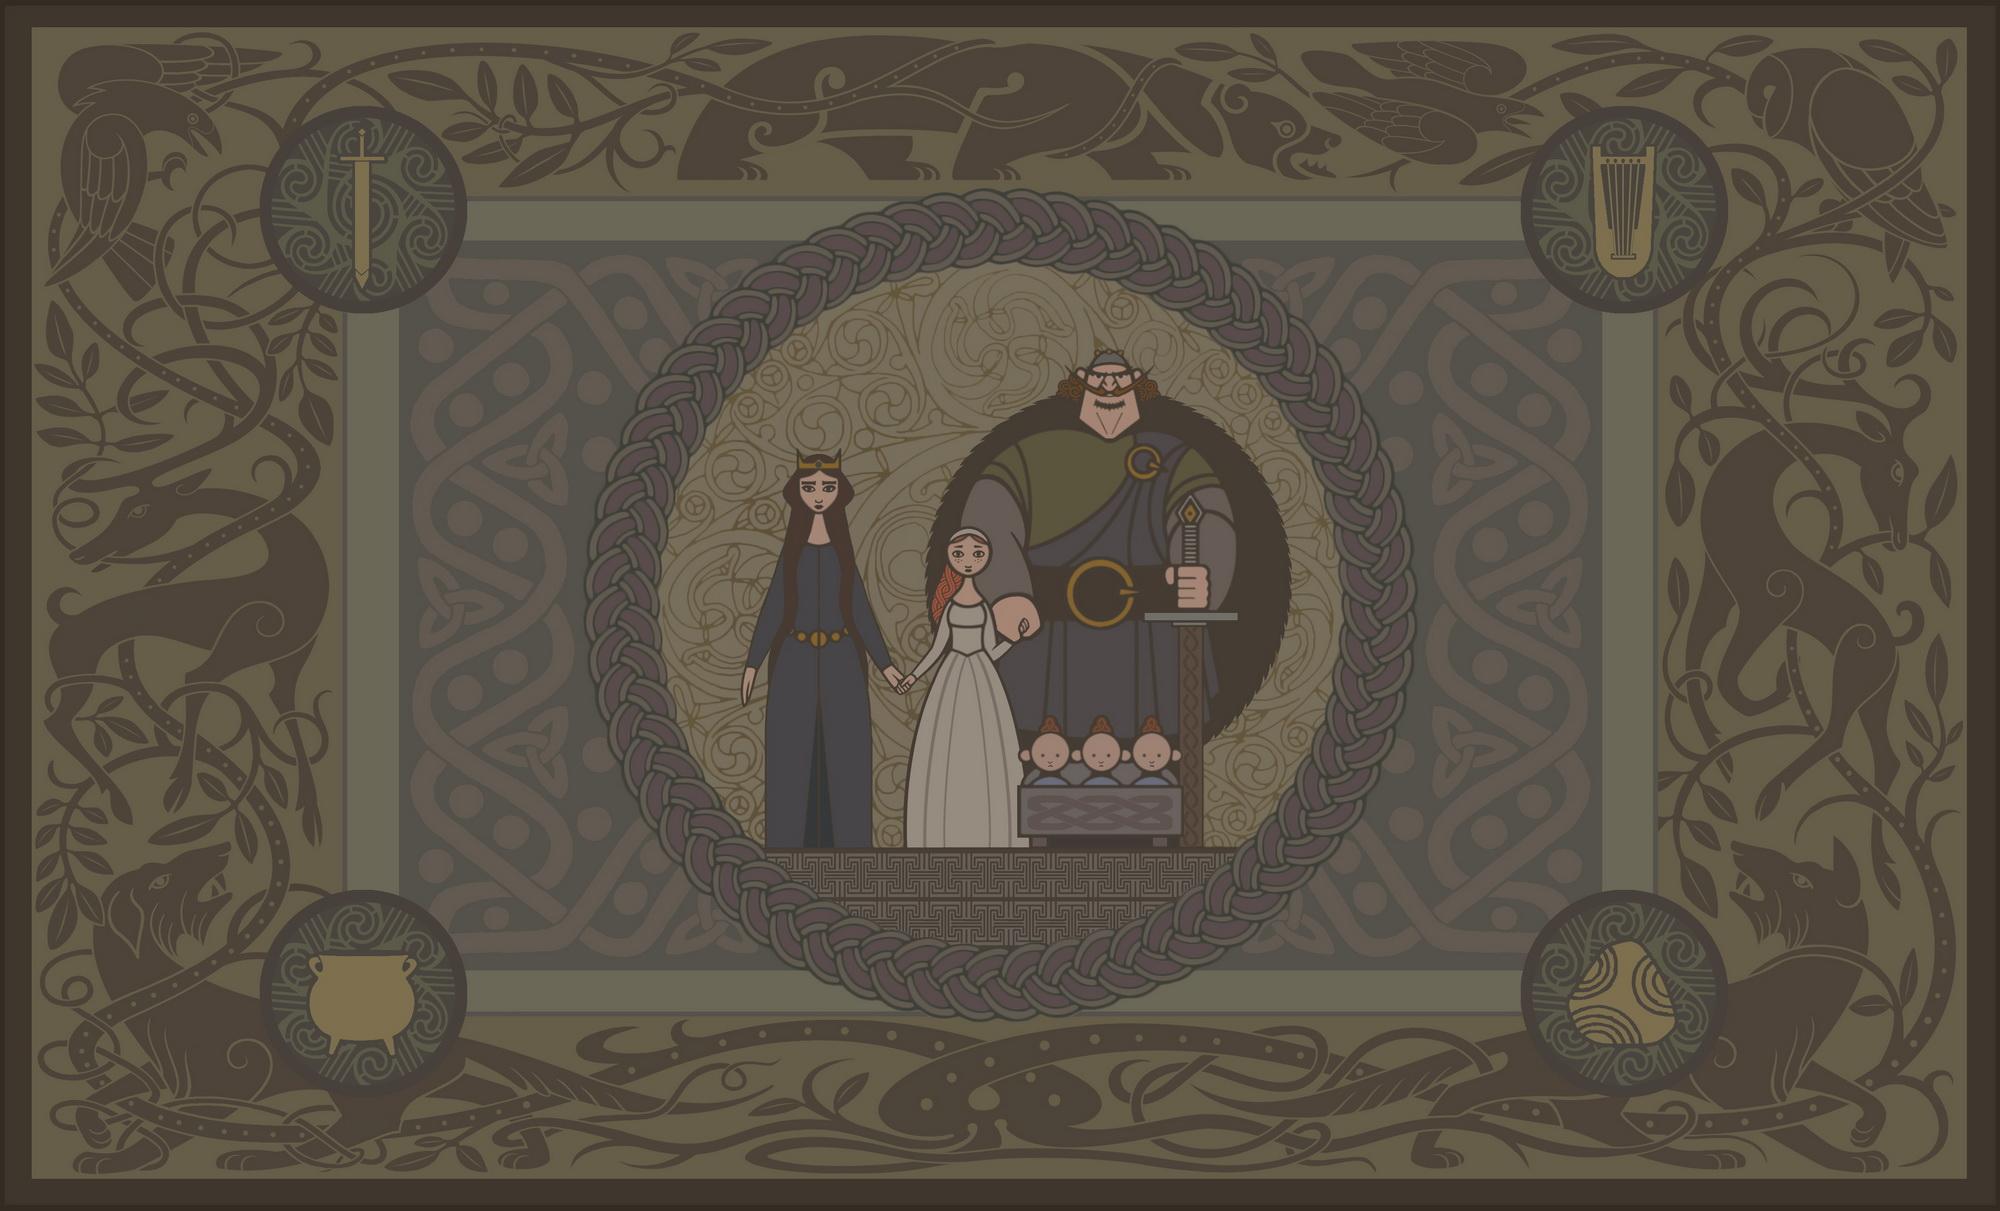 DunBroch Family Tapestry